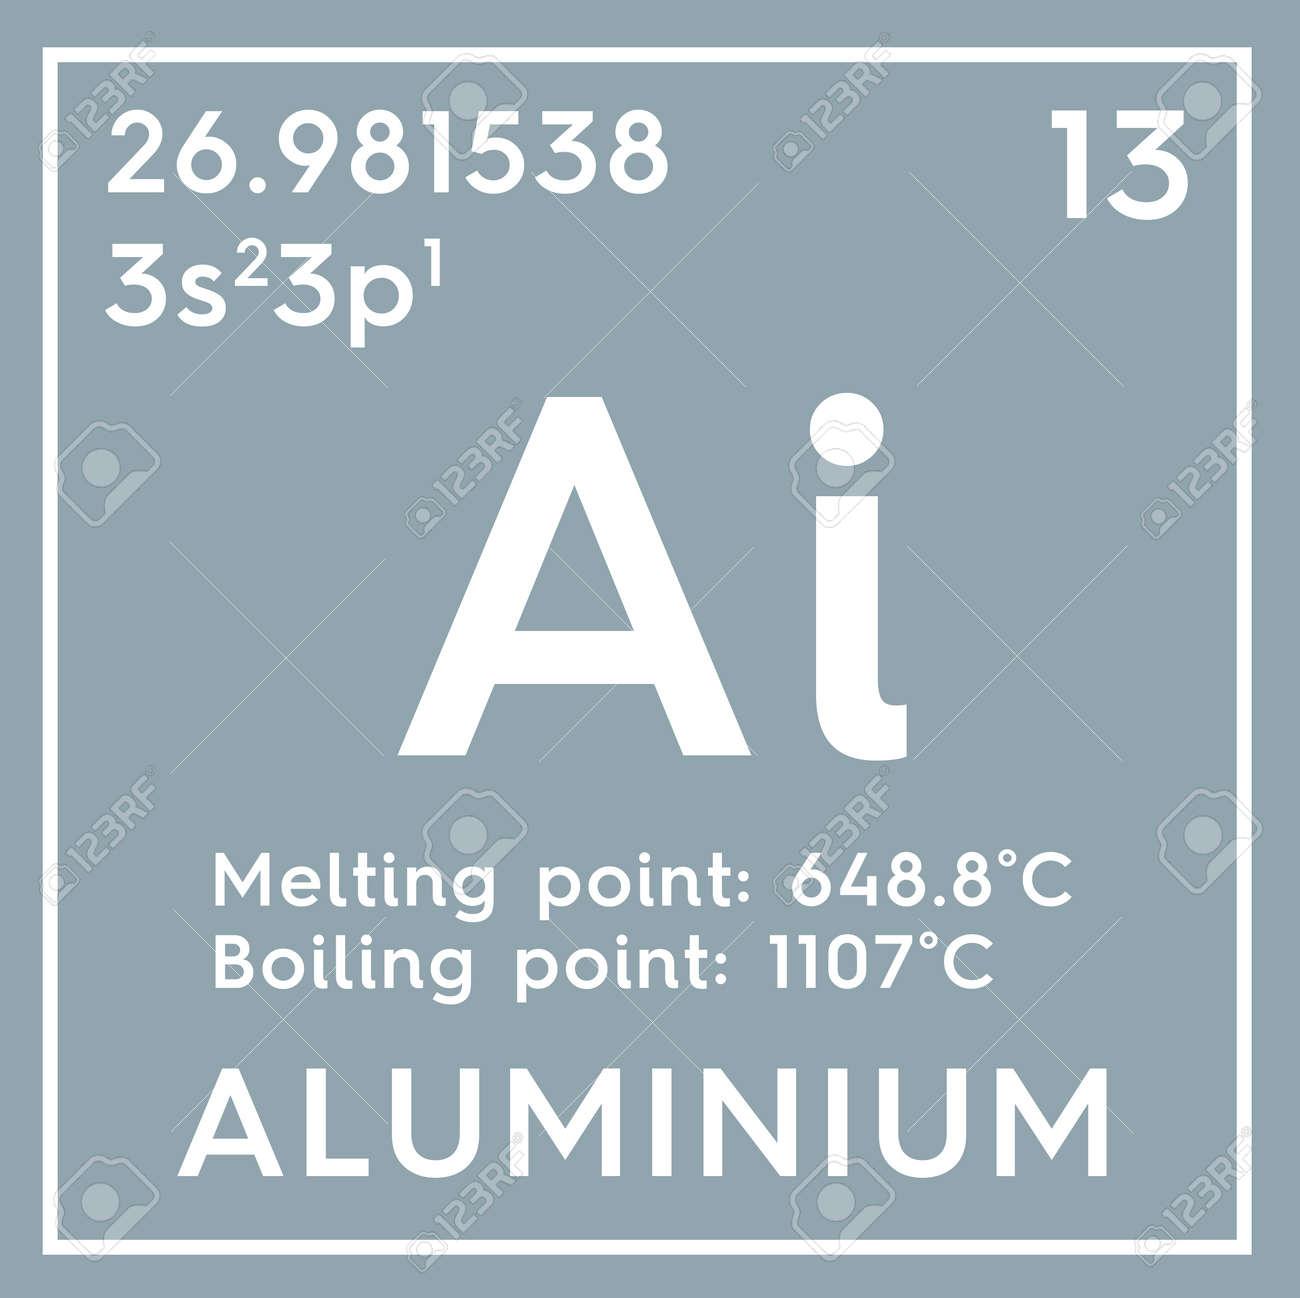 Aluminio metales posteriores a la transicin elemento qumico de aluminio metales posteriores a la transicin elemento qumico de la tabla peridica de mendeleev urtaz Choice Image